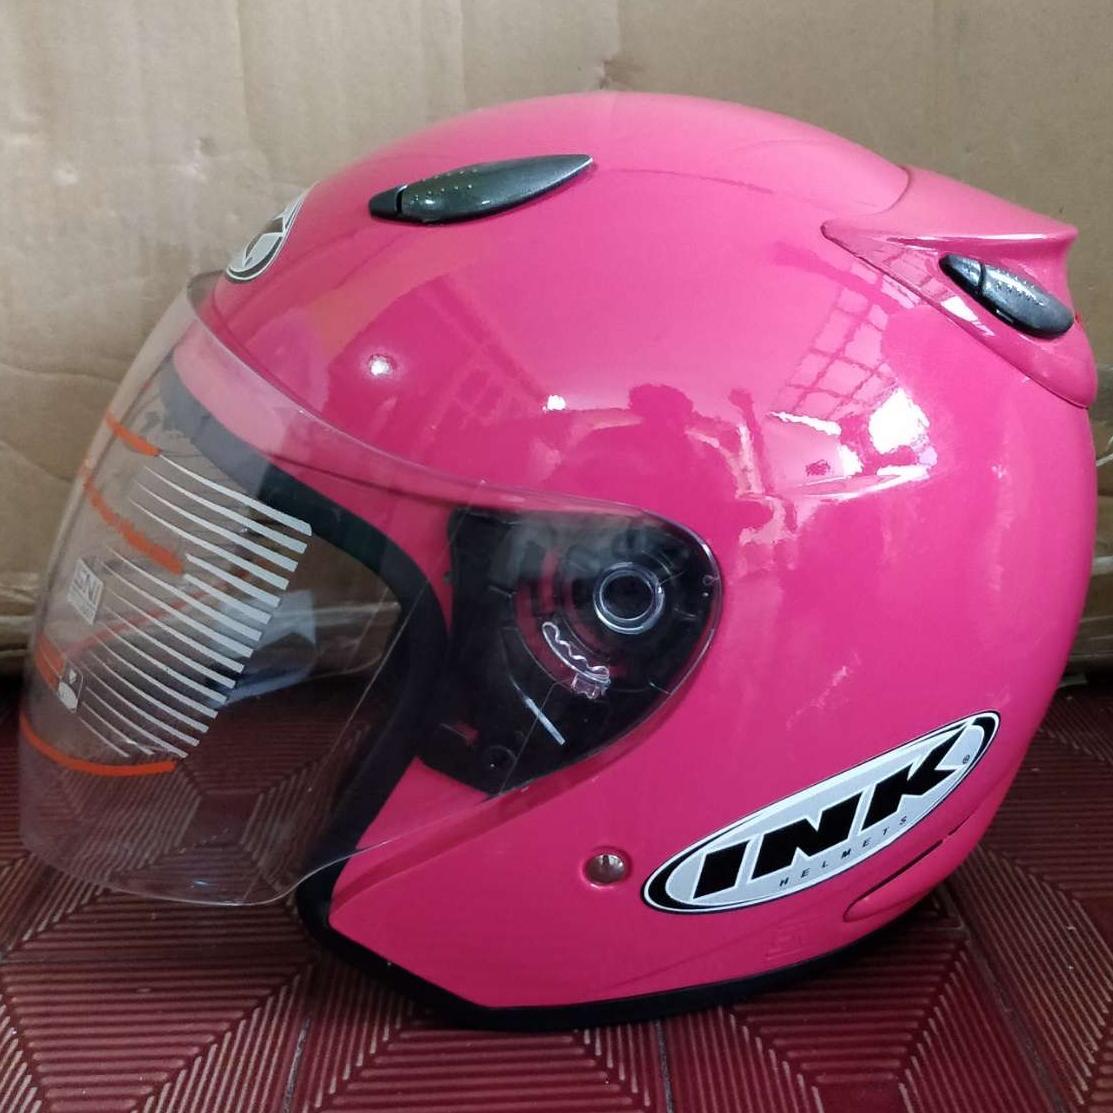 Helm ink centro pink magenta replika bkn original kyt bogo anak khusus dewasa pria wanita